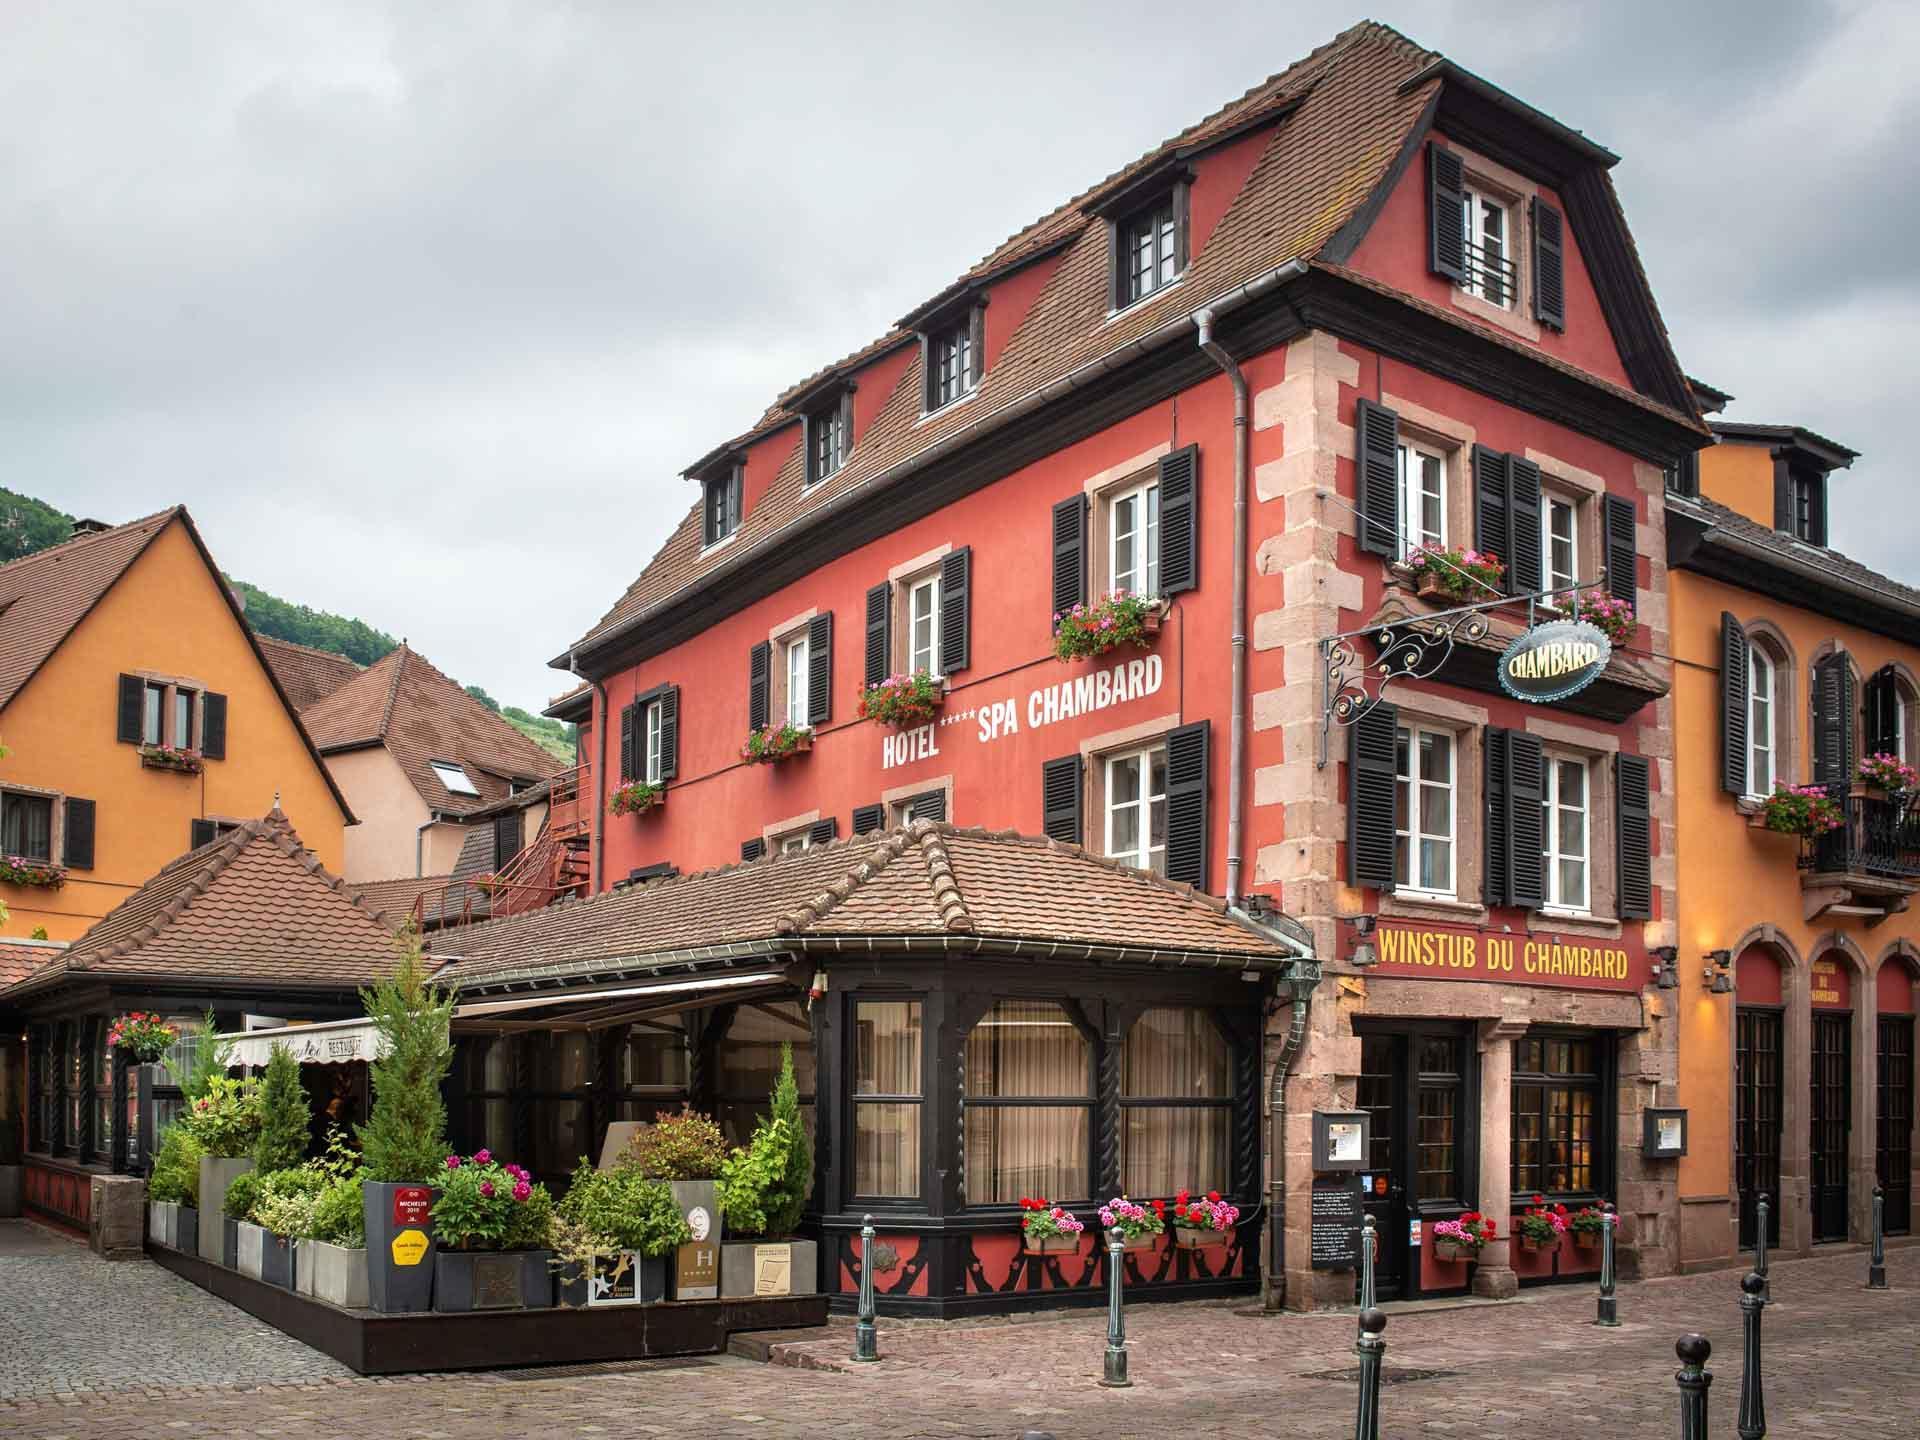 La façade pittoresque du Chambard © Kris Jacobs